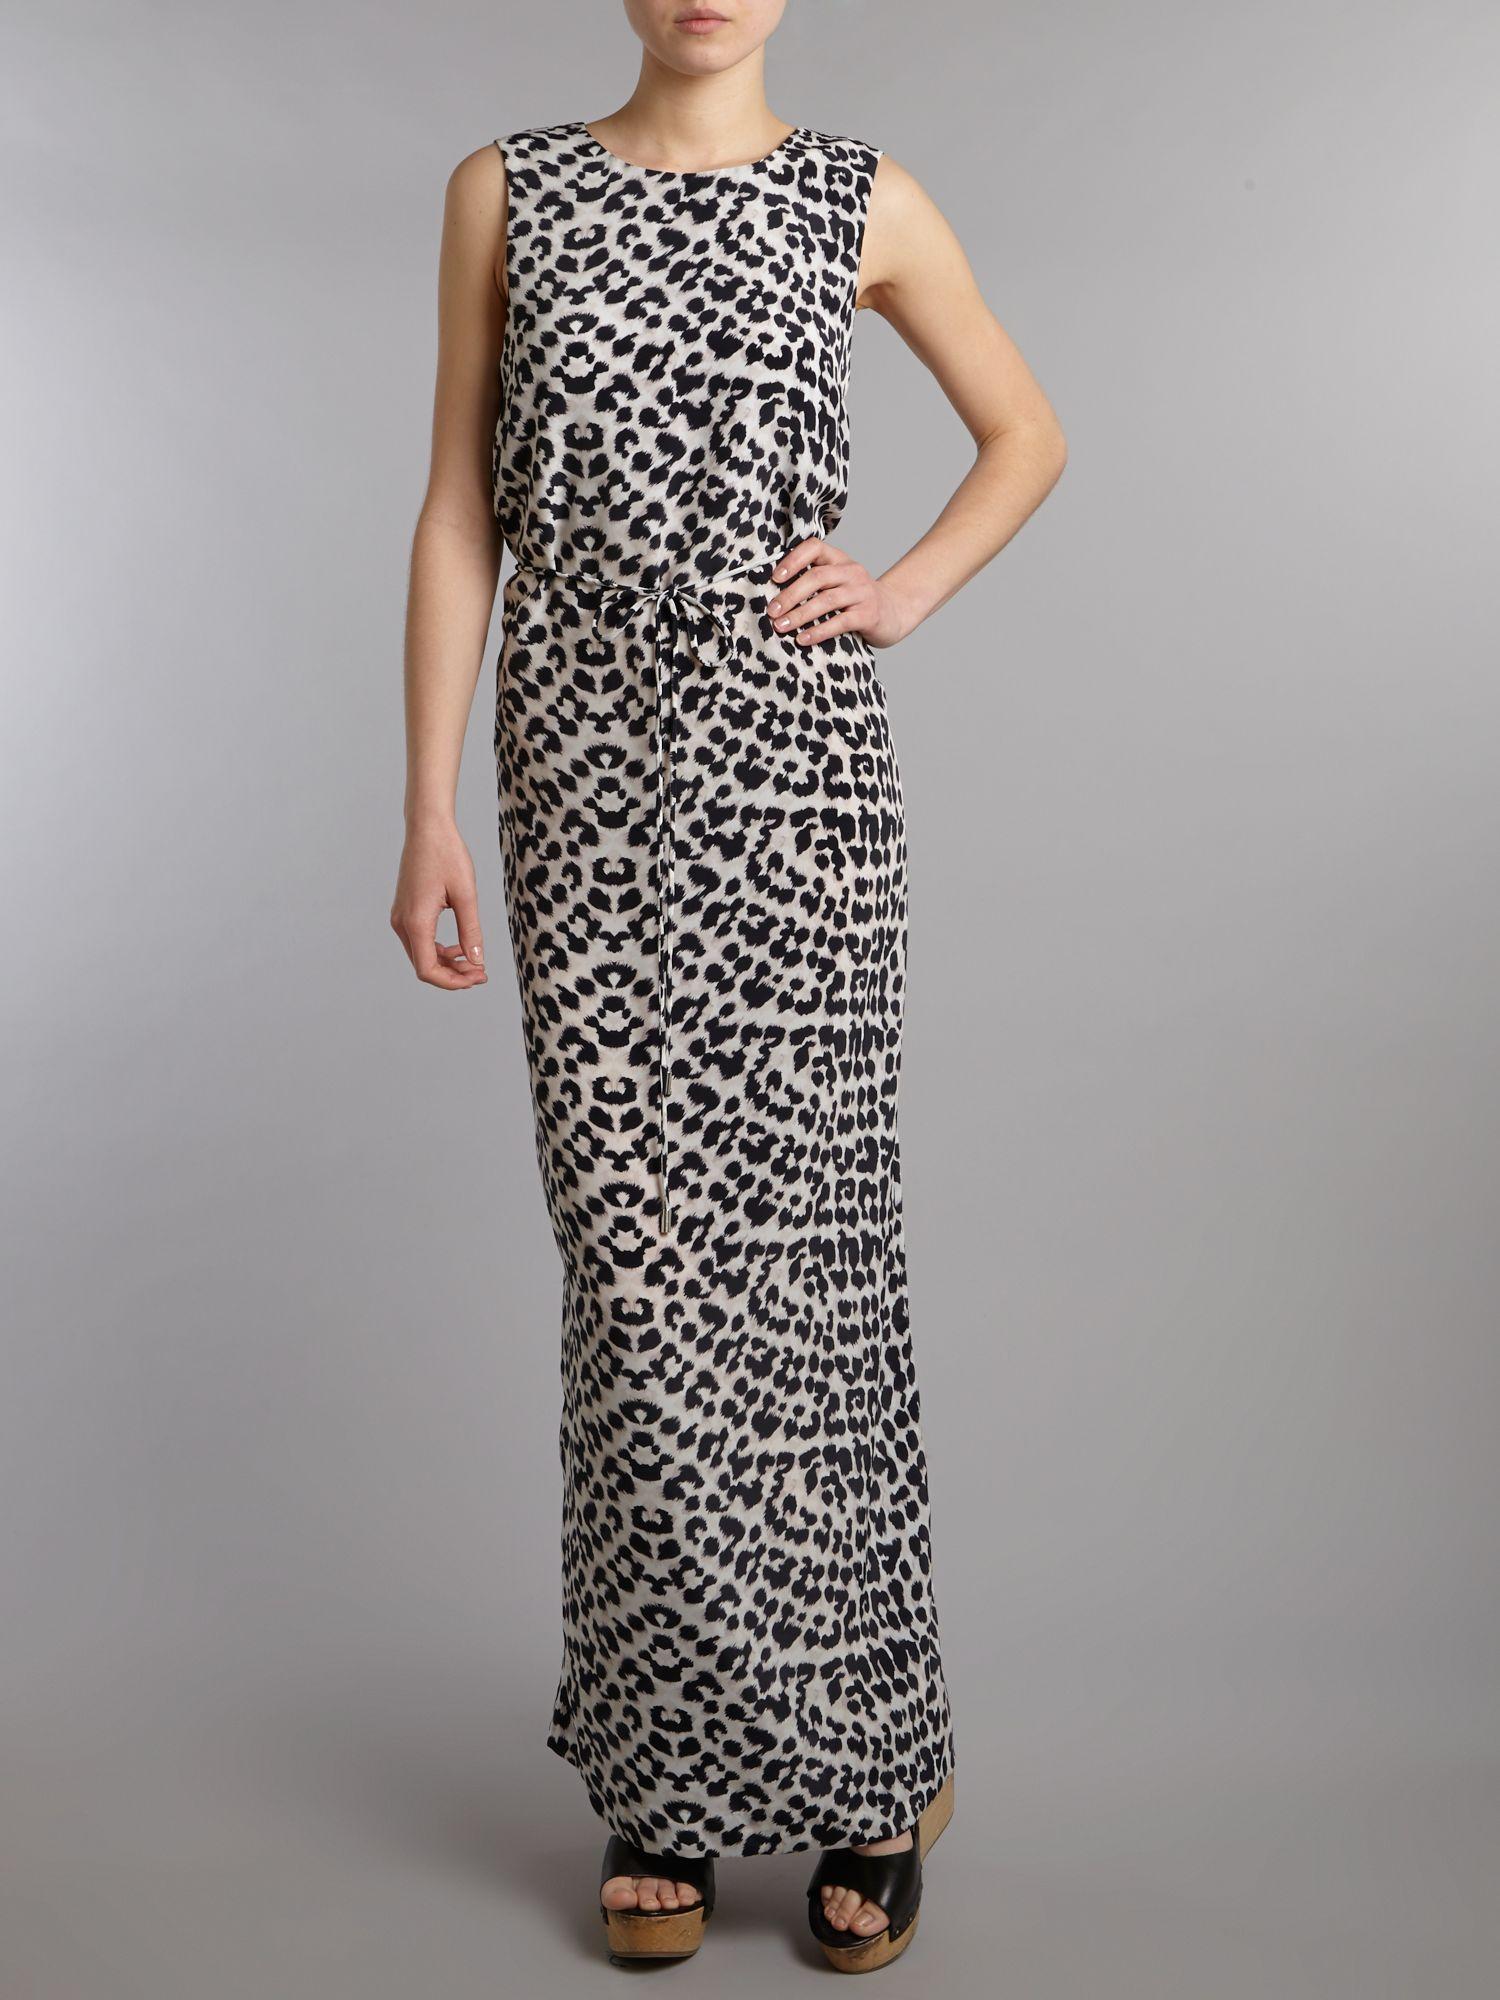 Grey animal print maxi dress